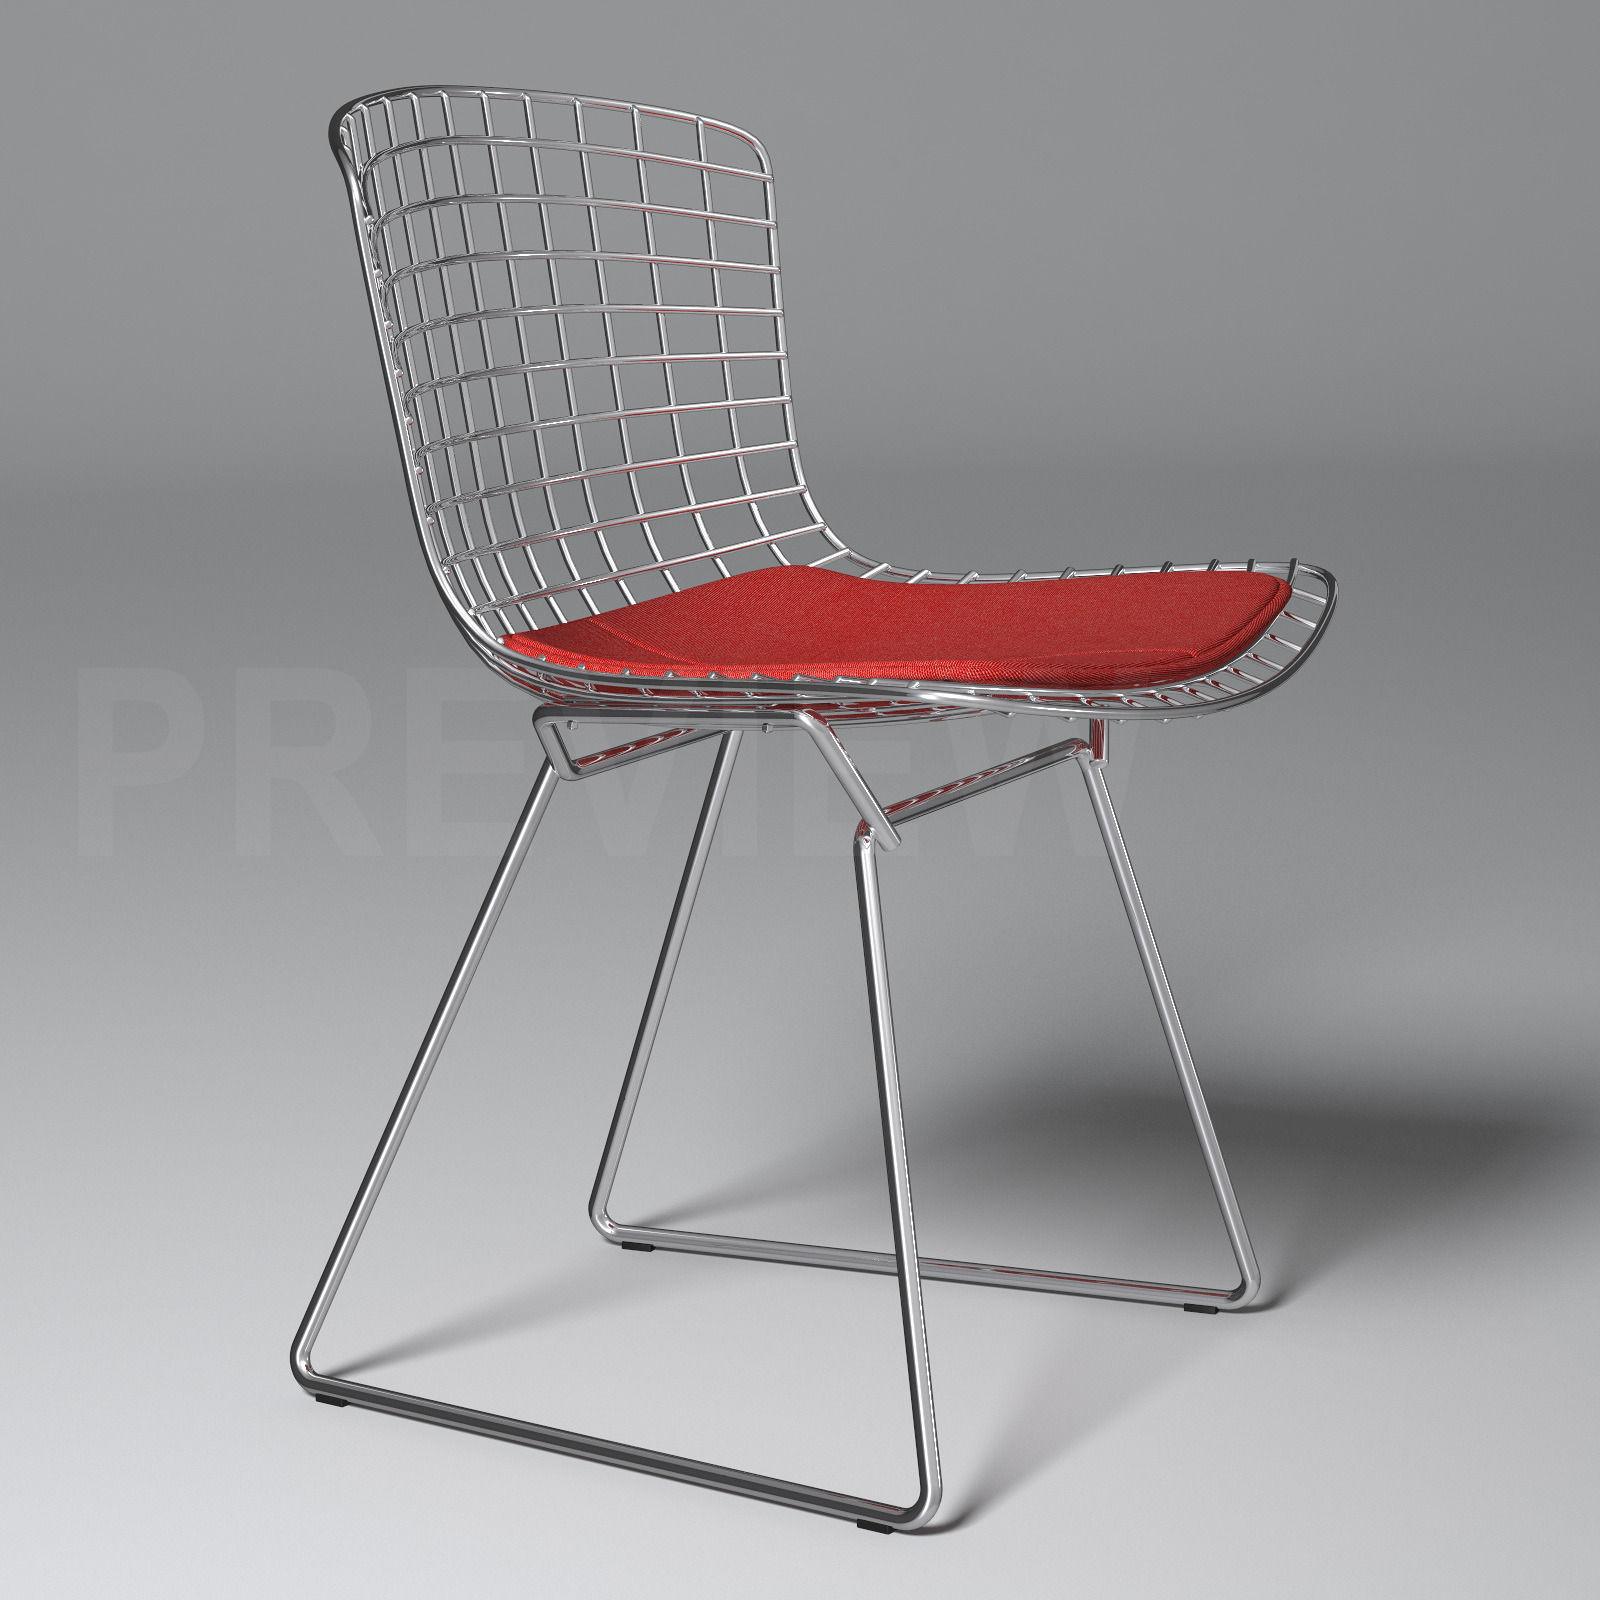 Bertoia chair knoll -  Bertoia Side Chair Knoll 3d Model Max Obj Fbx 4